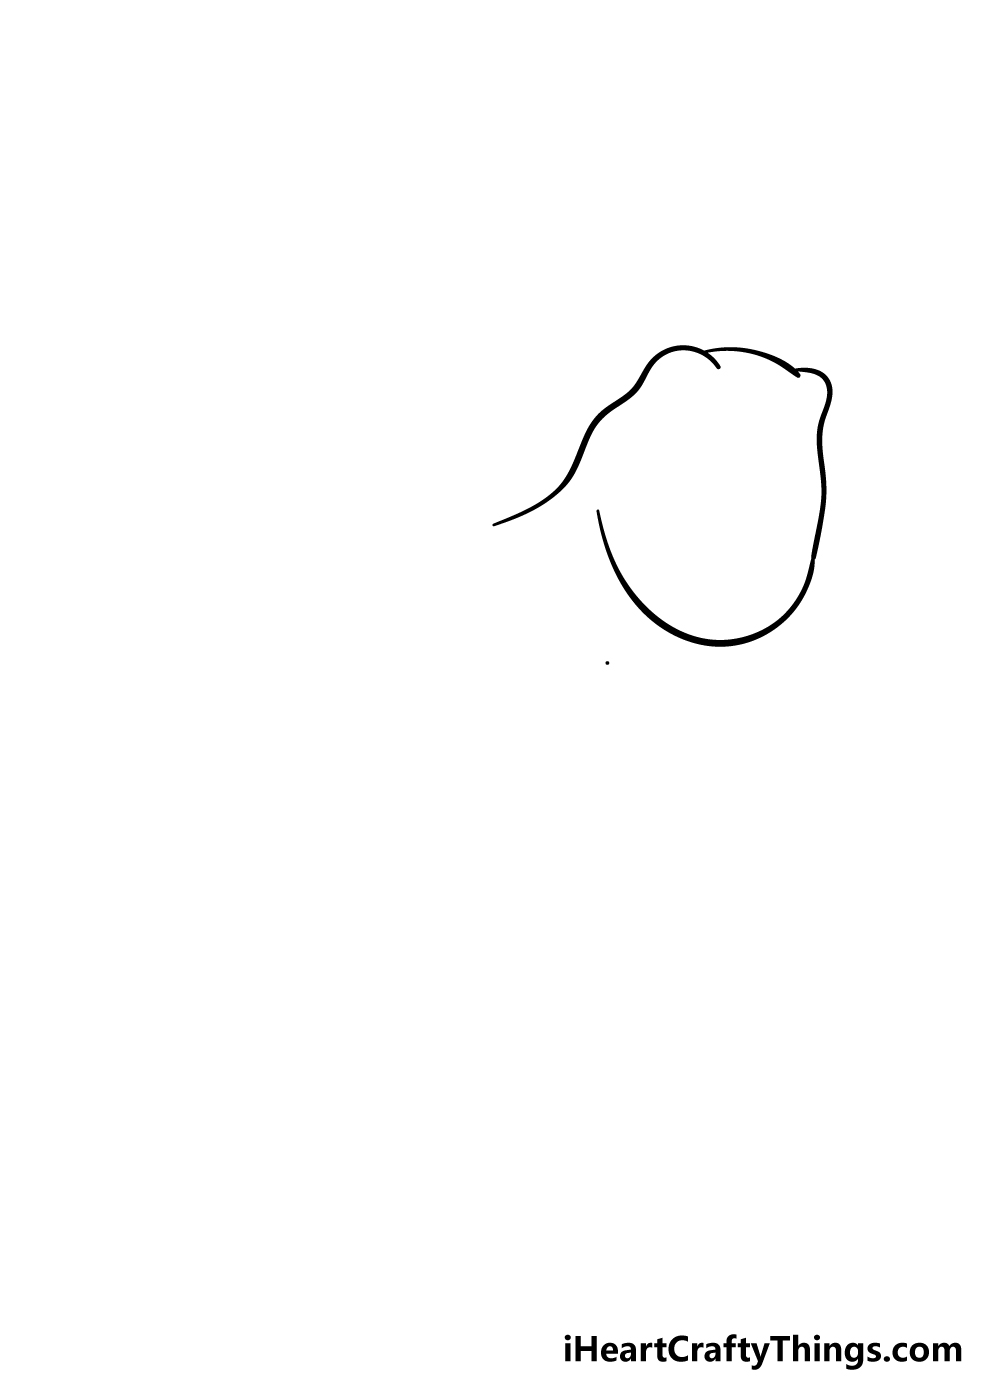 t-rex drawing step 1